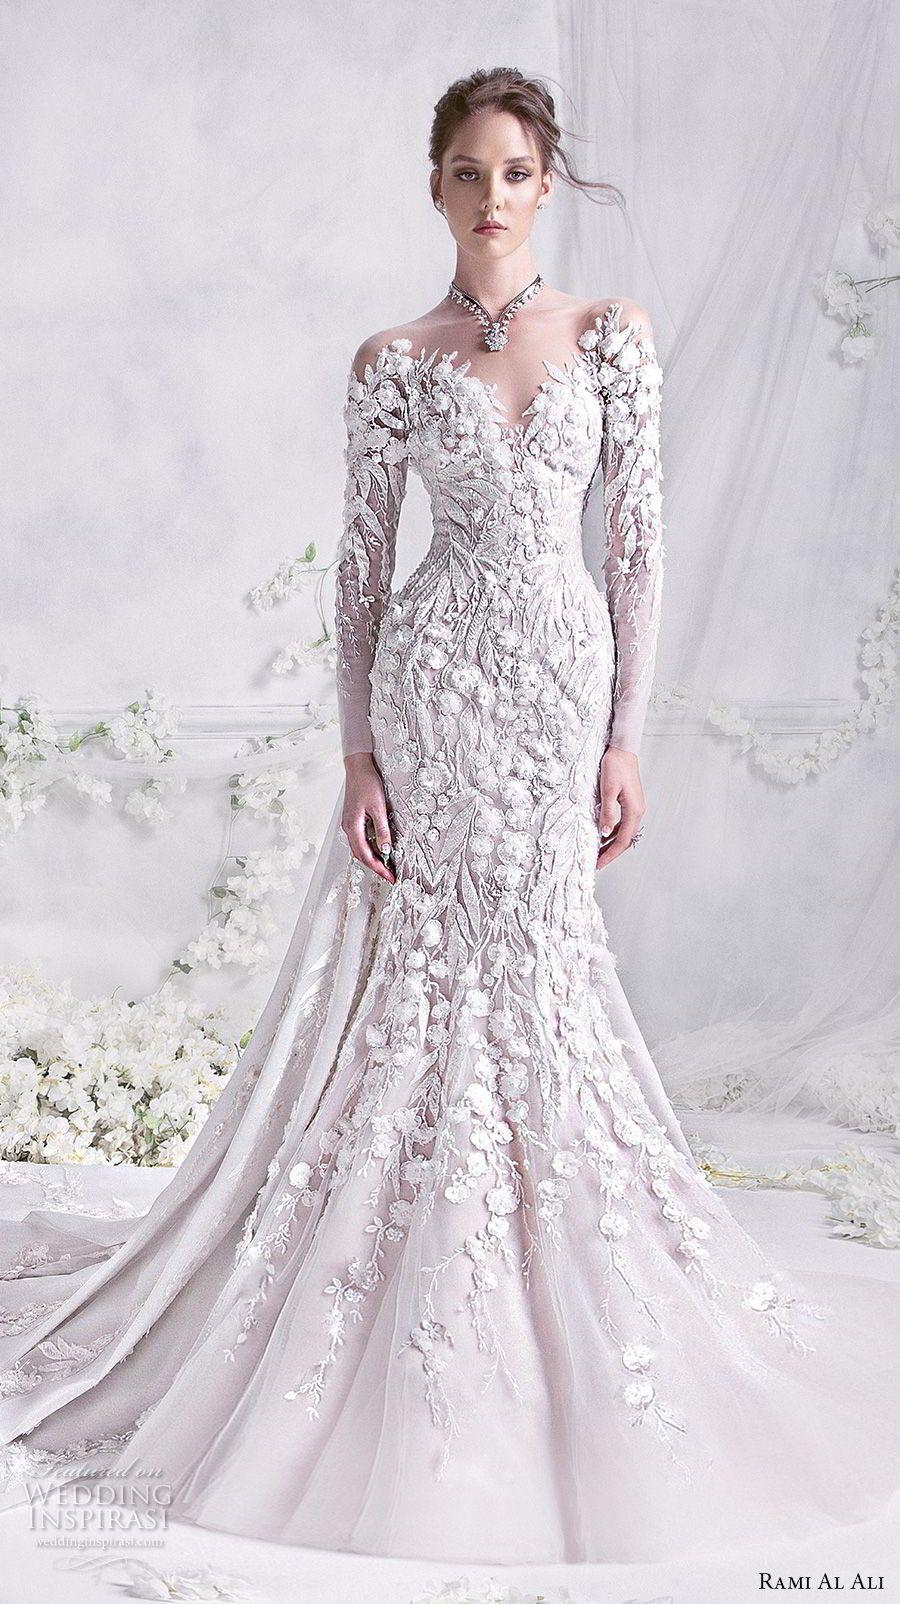 Rami al ali wedding dresses mermaid wedding dresses trumpets